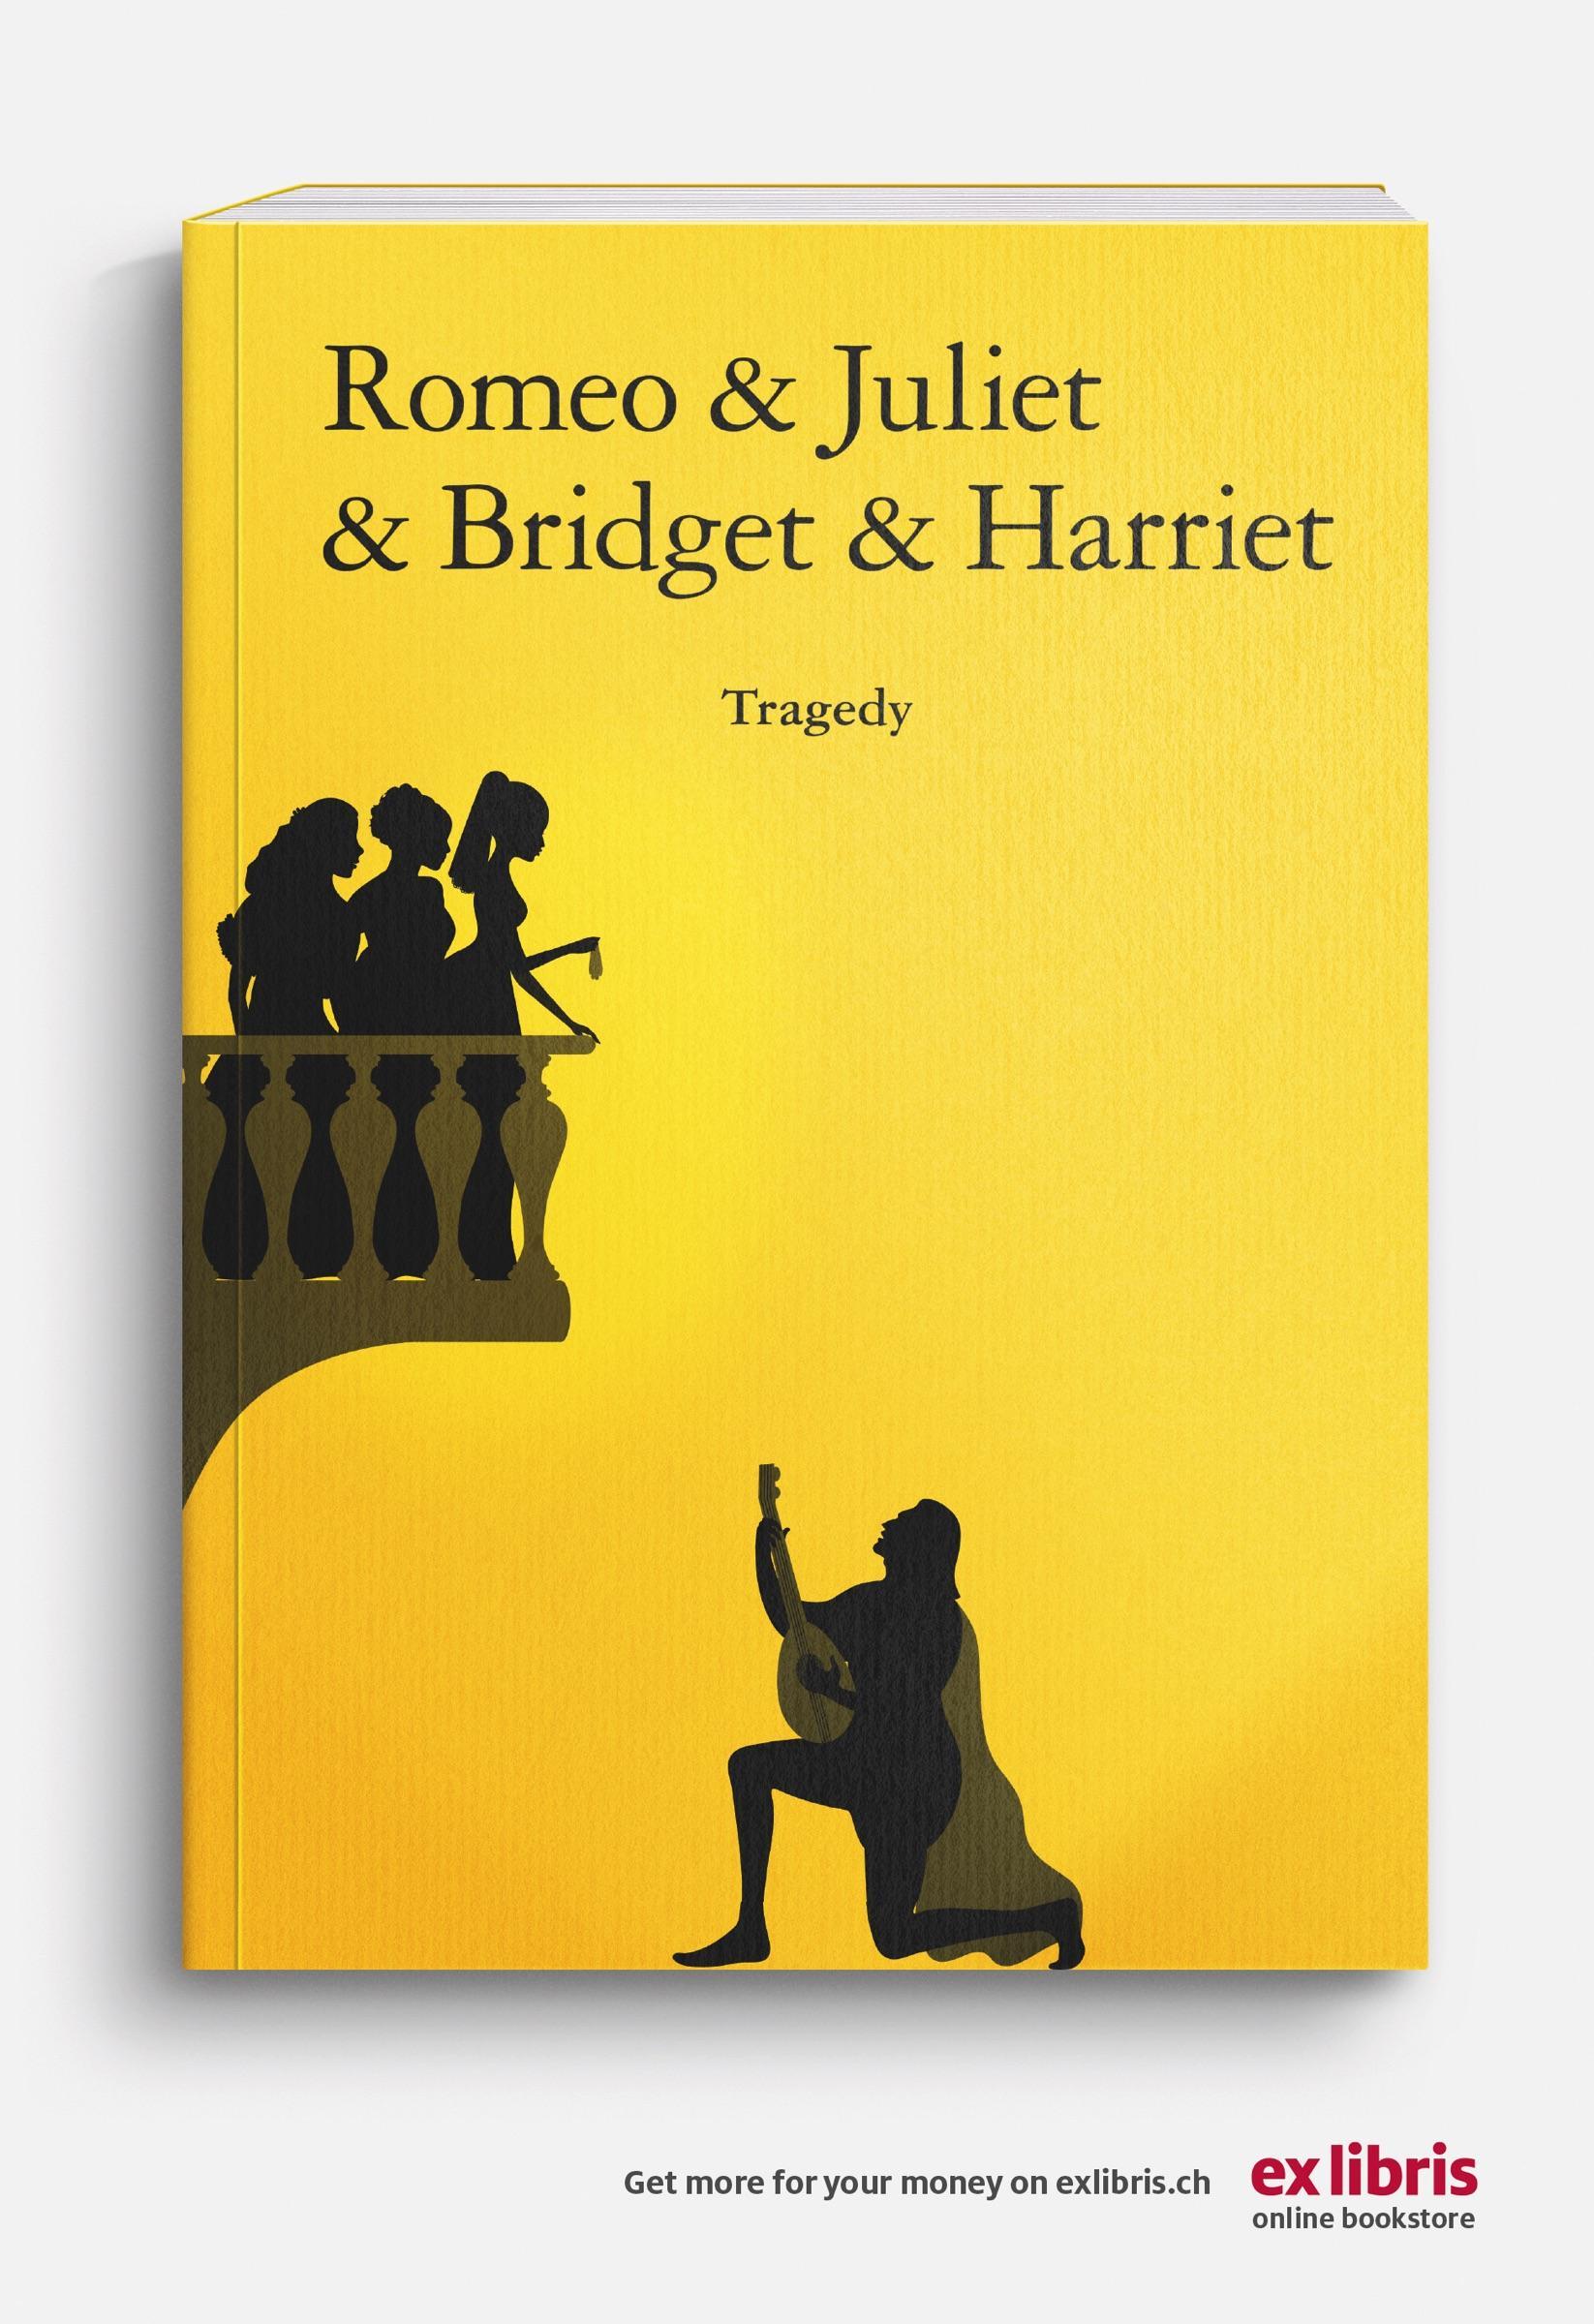 Ex Libris Print Ad - Romeo & Juliet & Bridget & Harriet